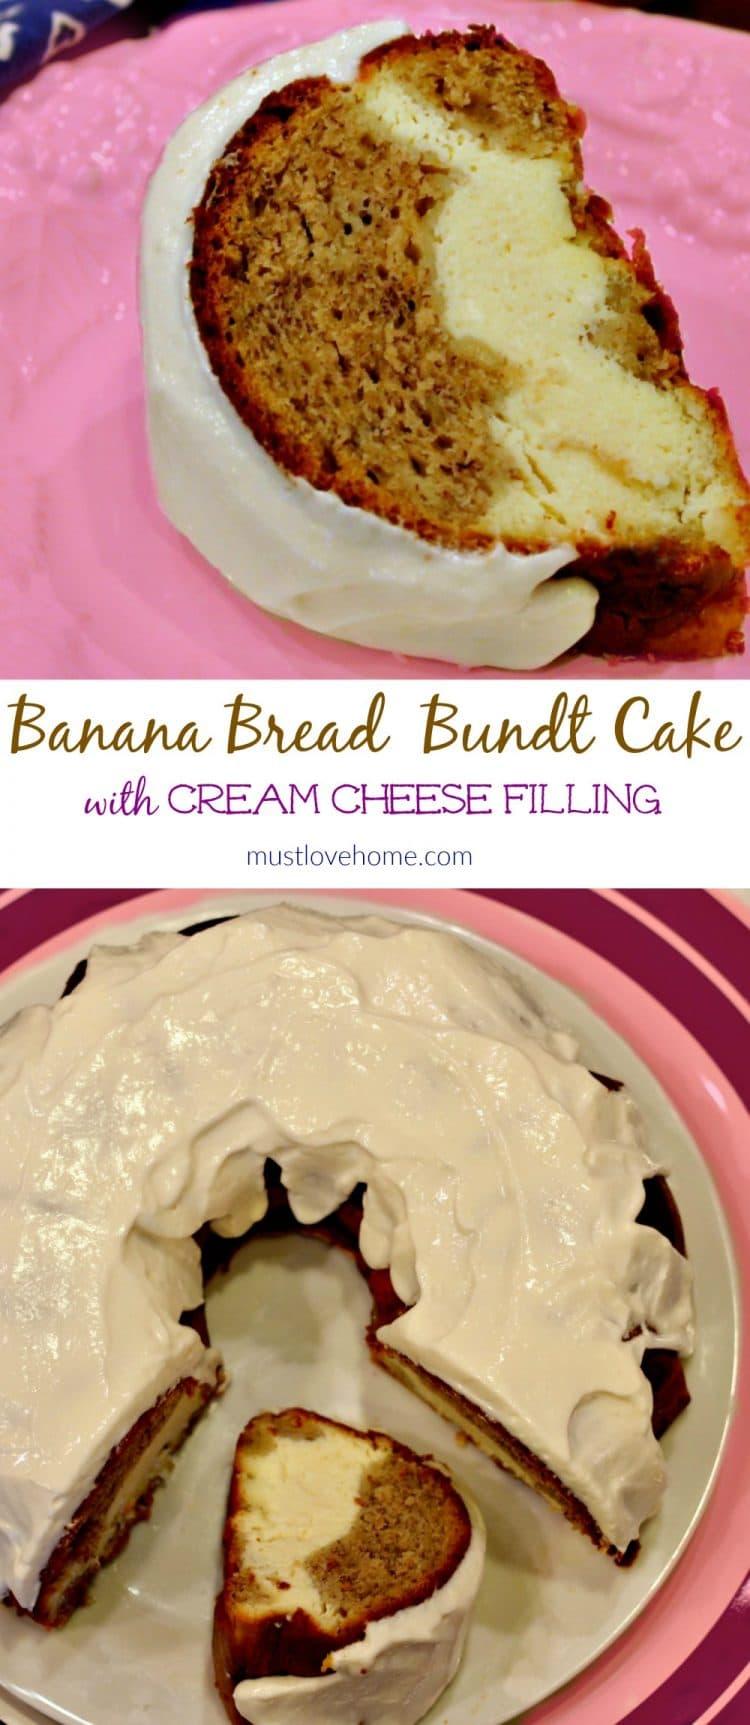 Spread Cake Mix Into Bundt Pan